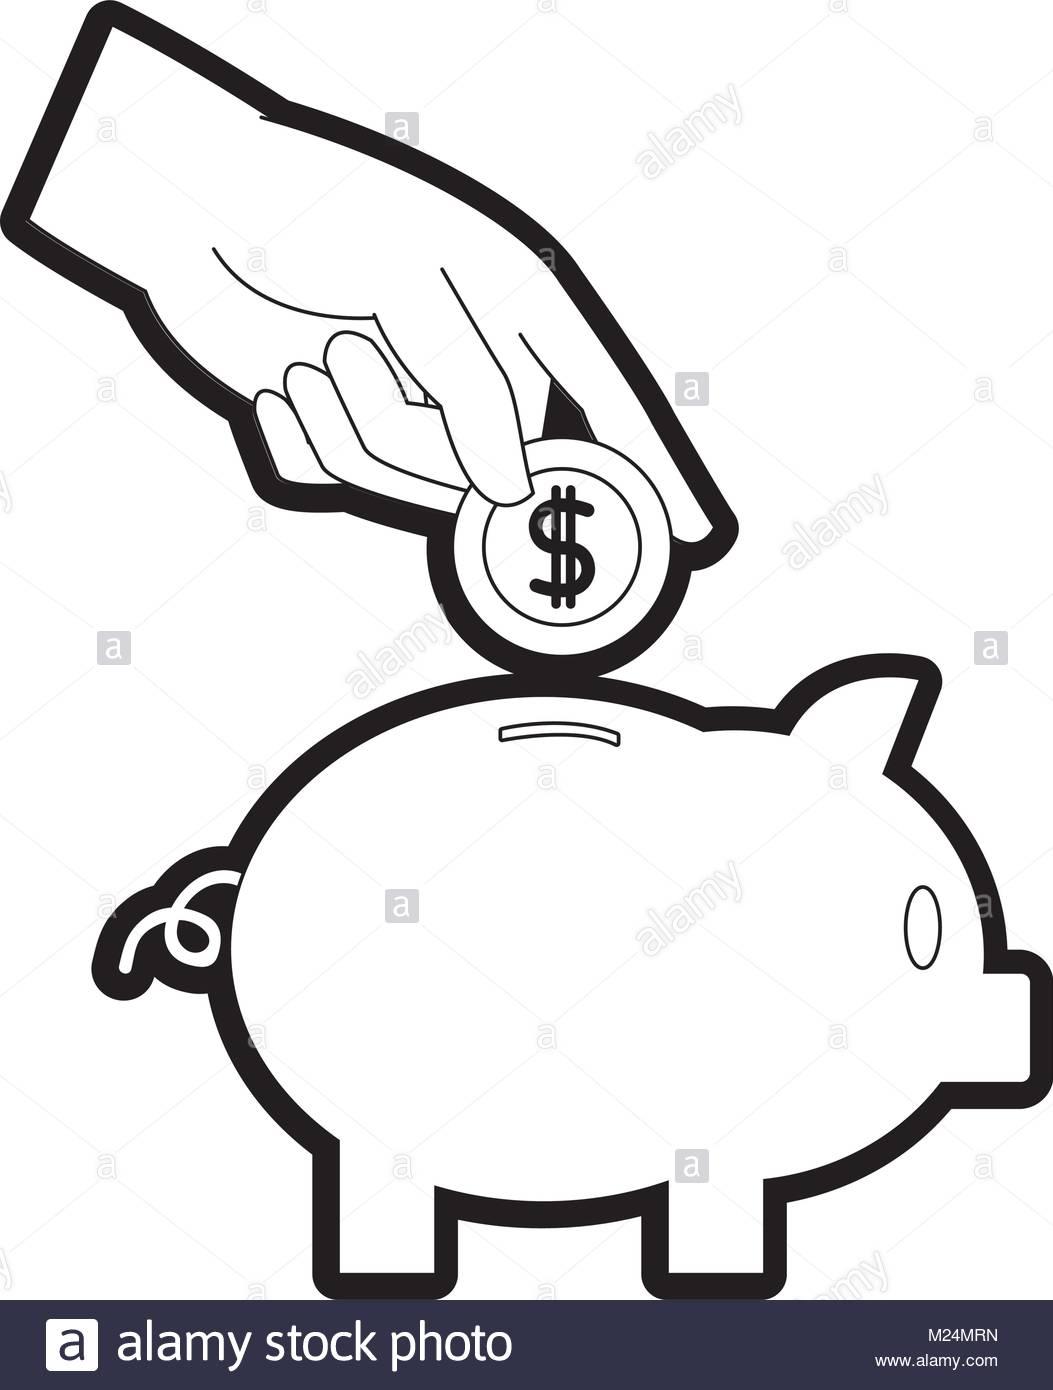 1053x1390 Coin Money Increase Stock Vector Images